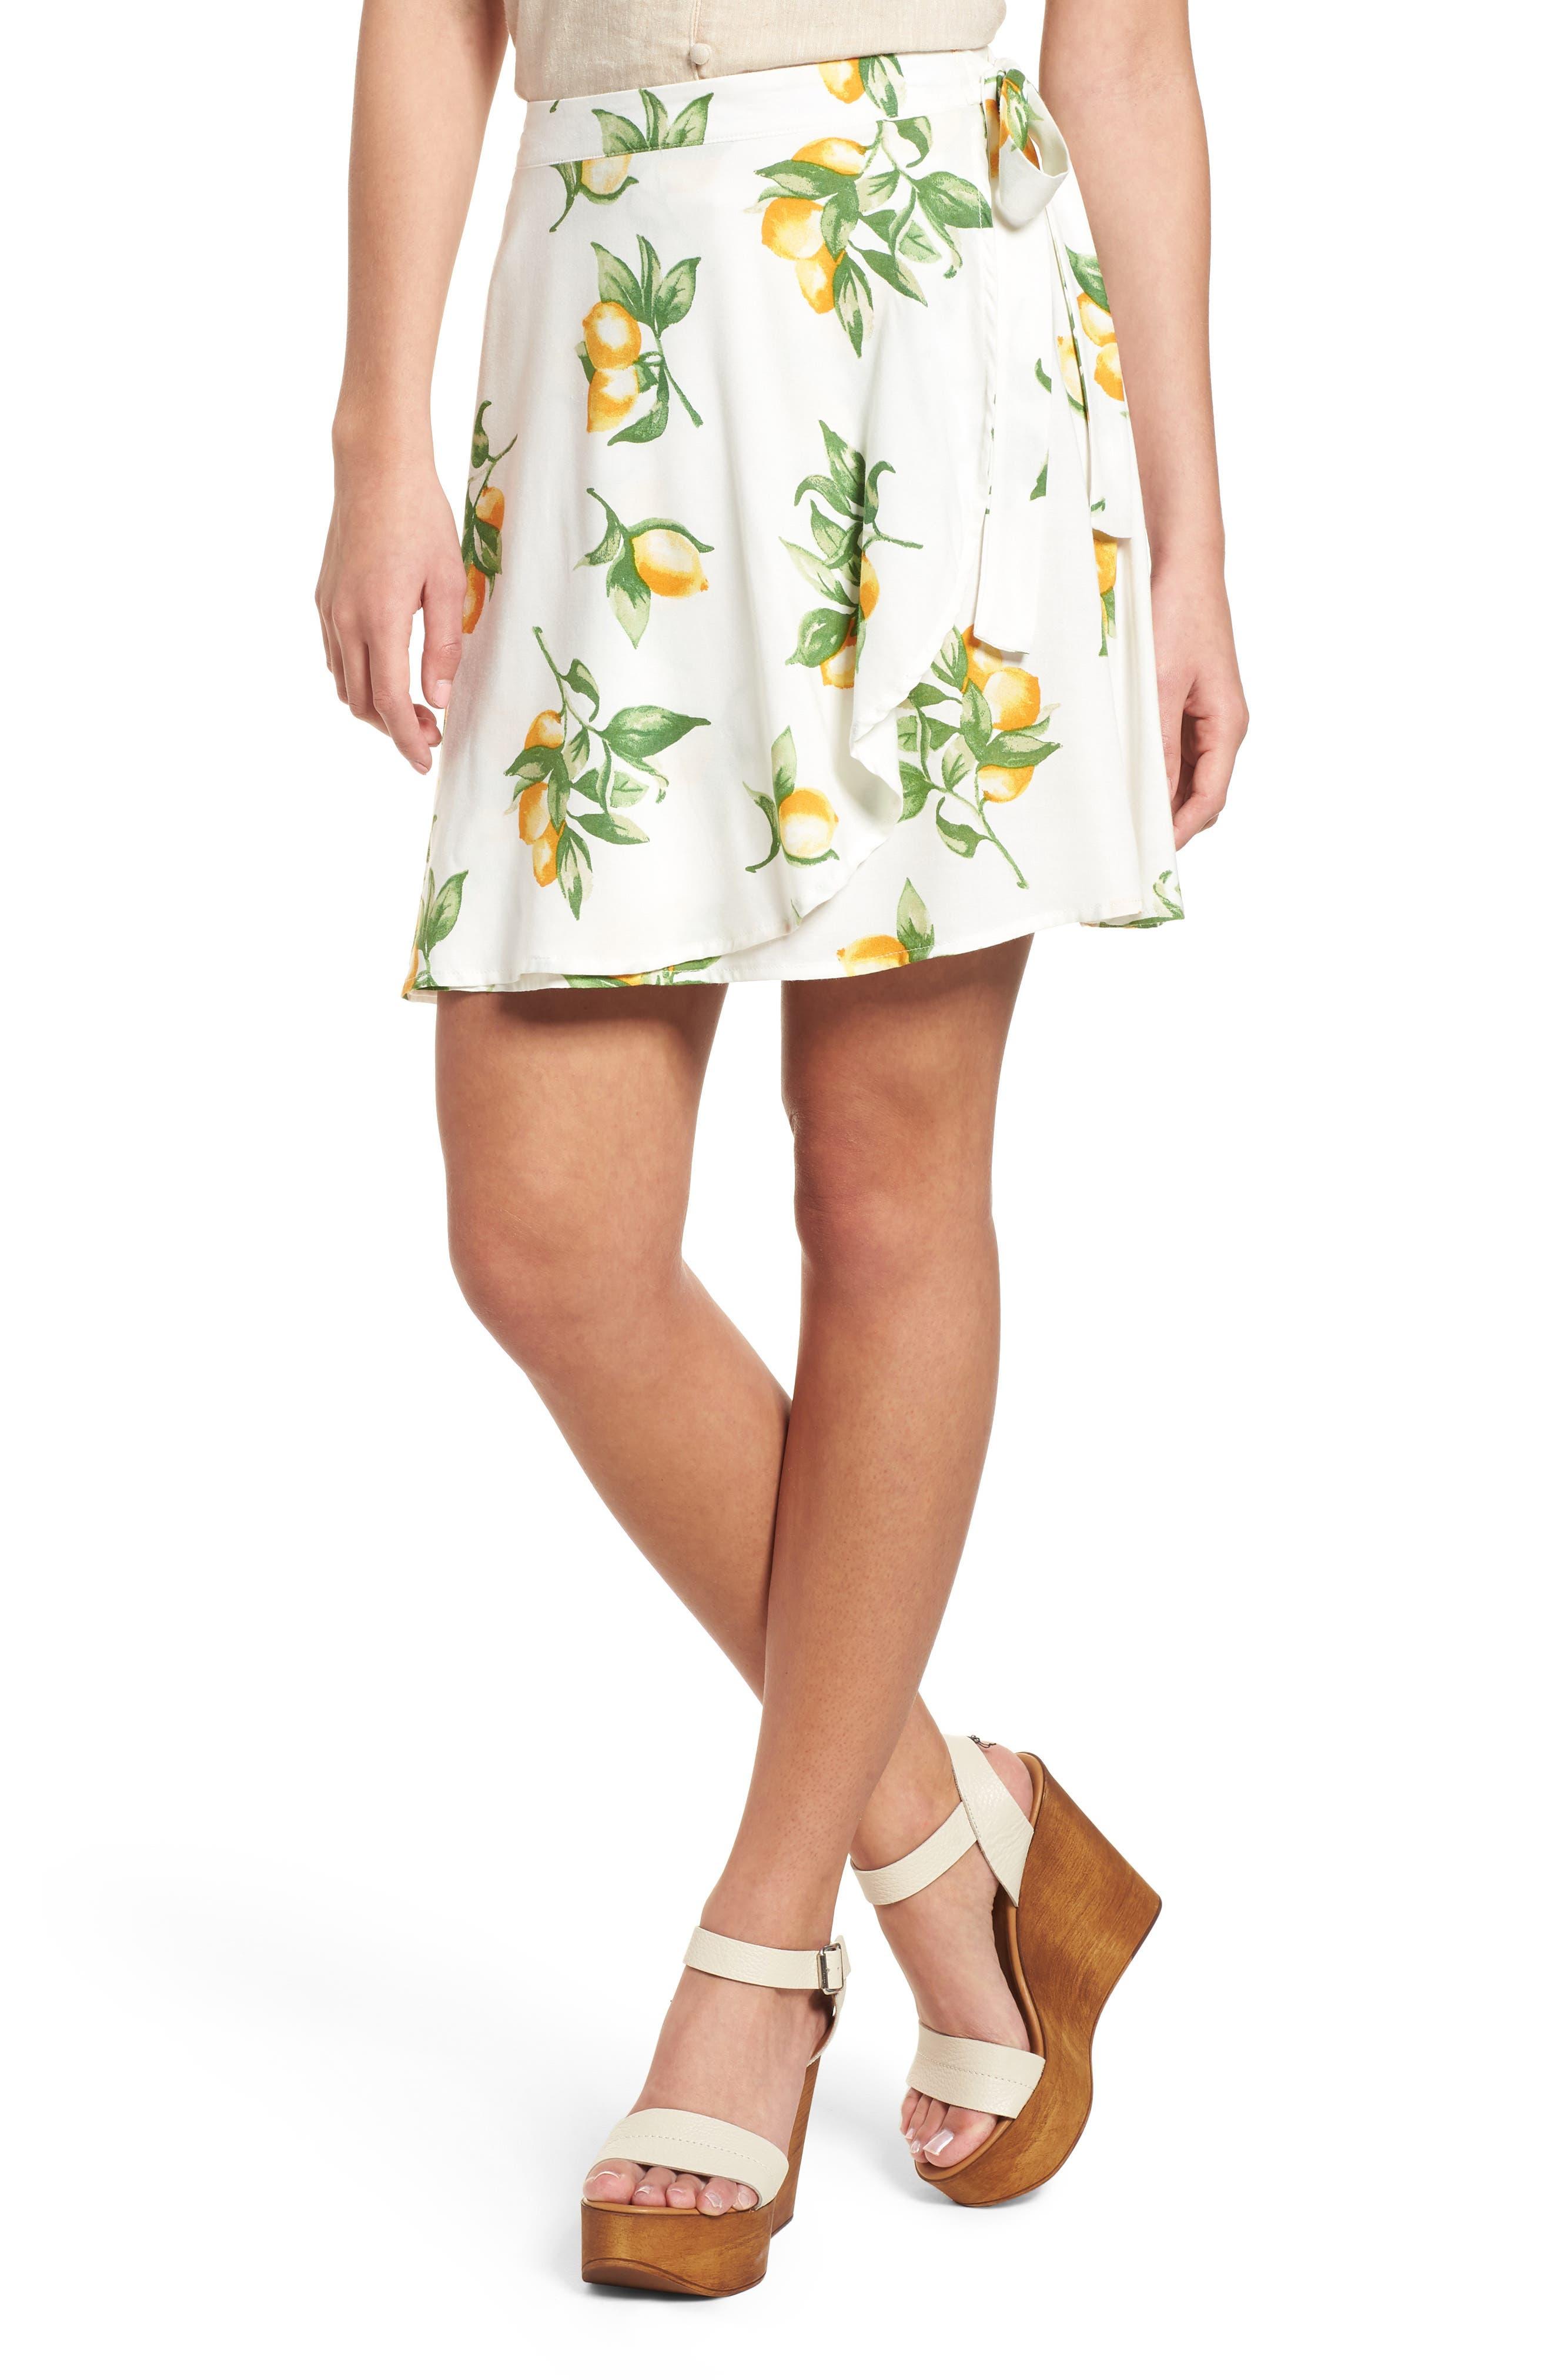 Mimi Chica Fruit Print Side Tie Skirt